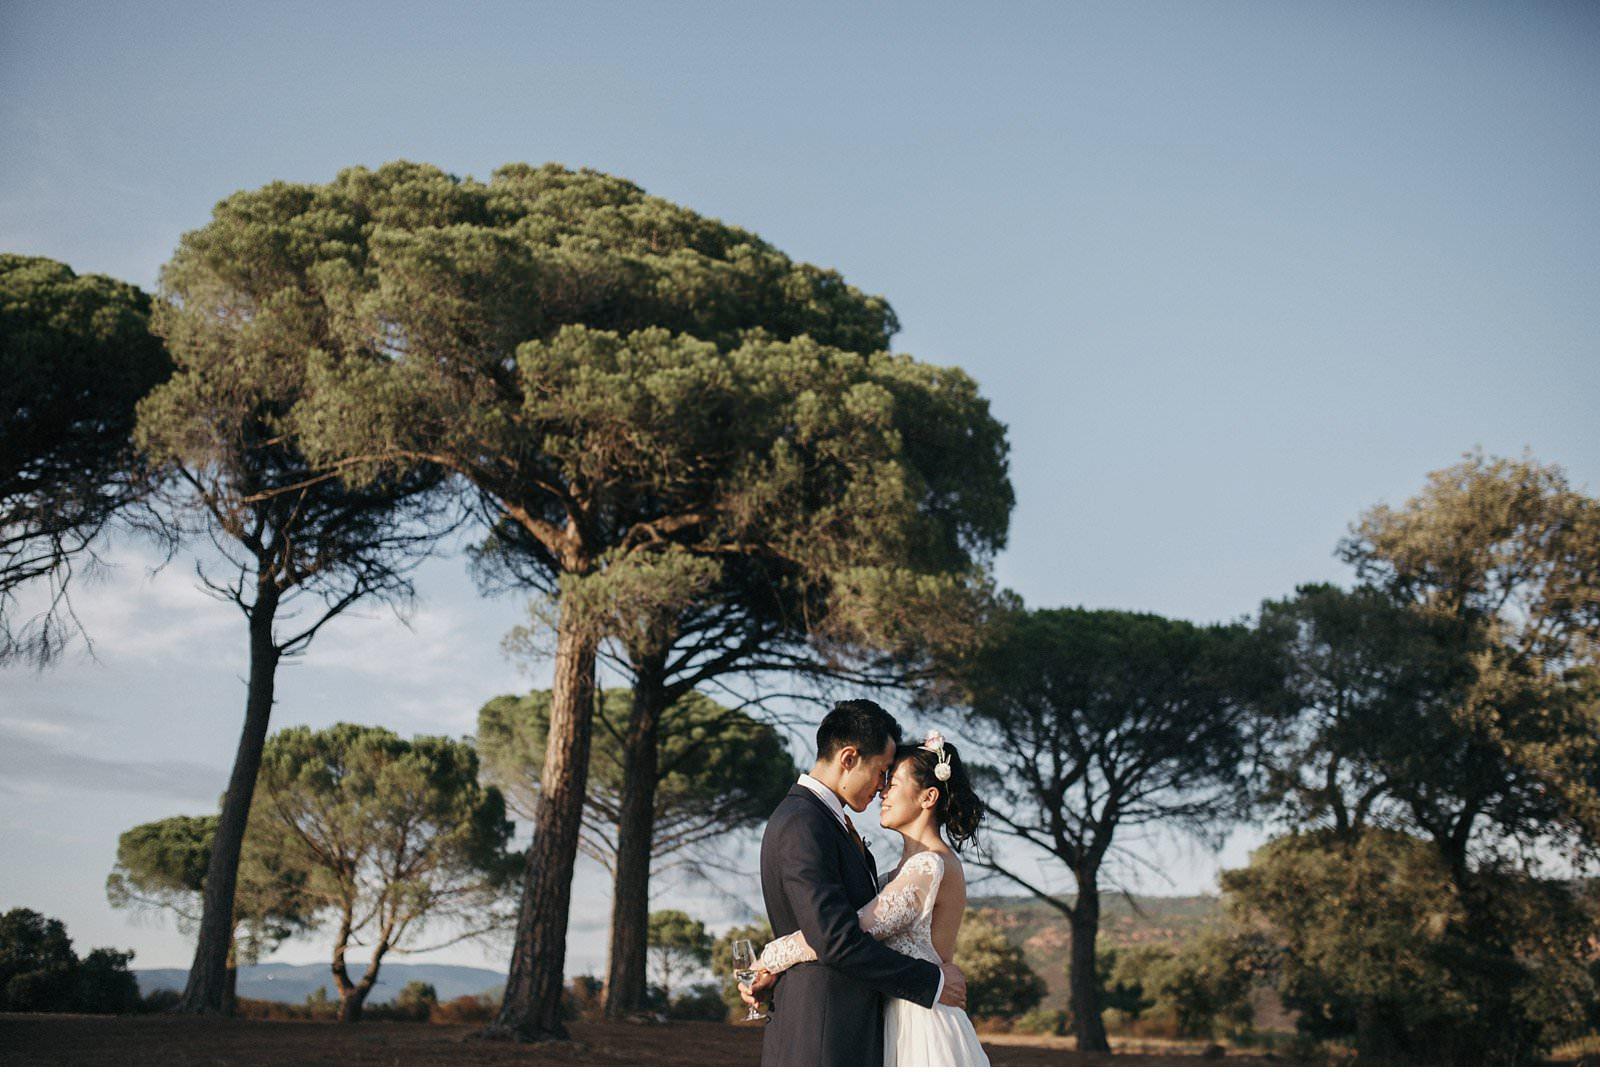 Sebastien Boudot Photographe de Mariage en Provence